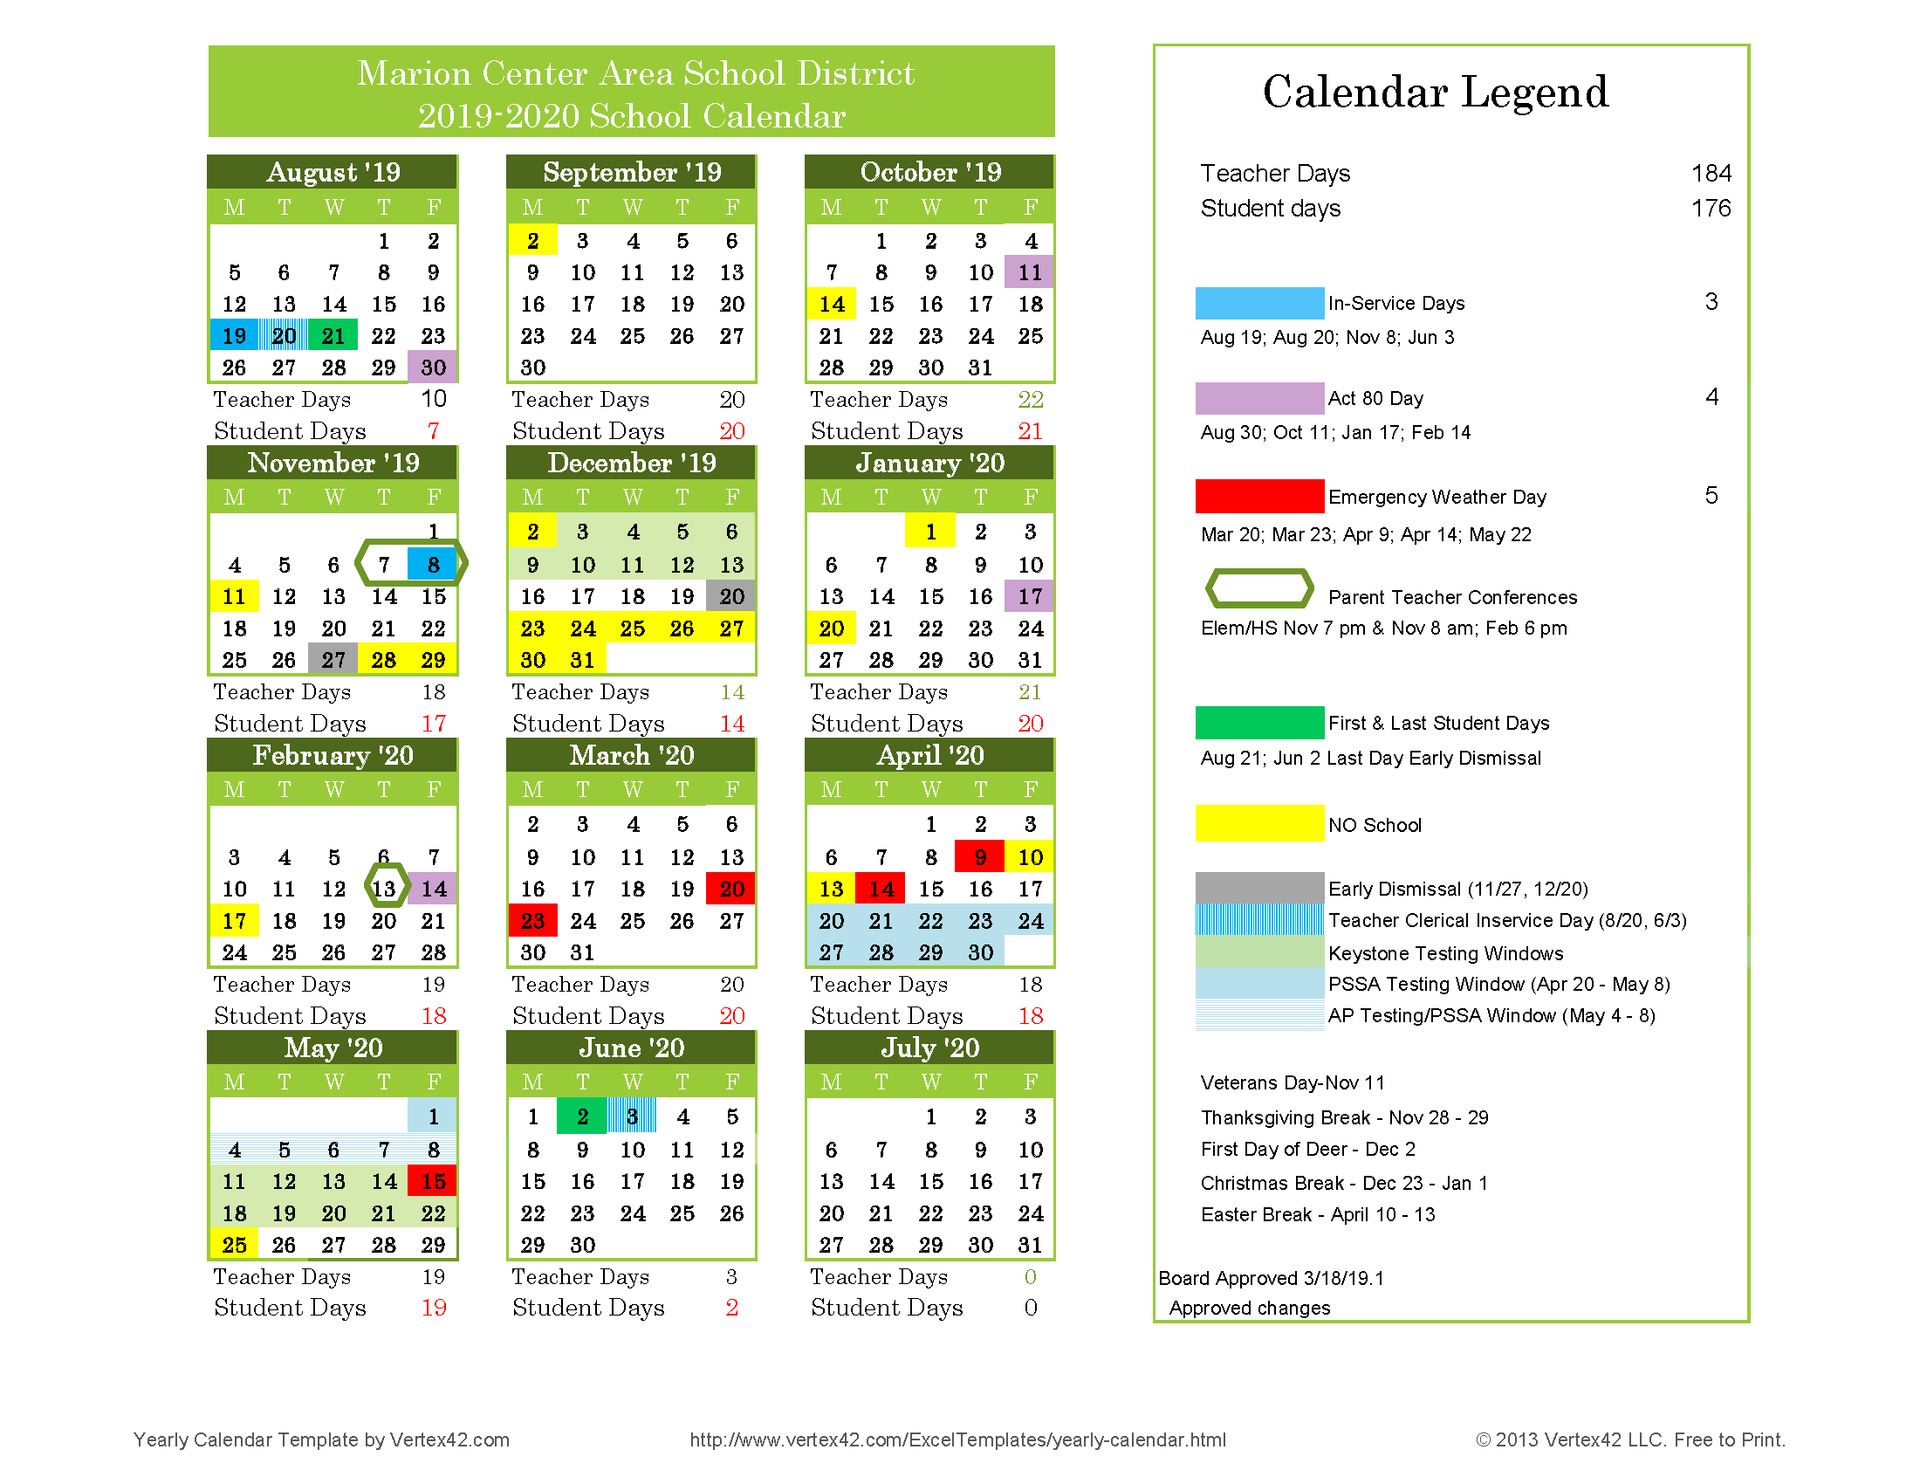 2019-2020 School Calendar approved 031819